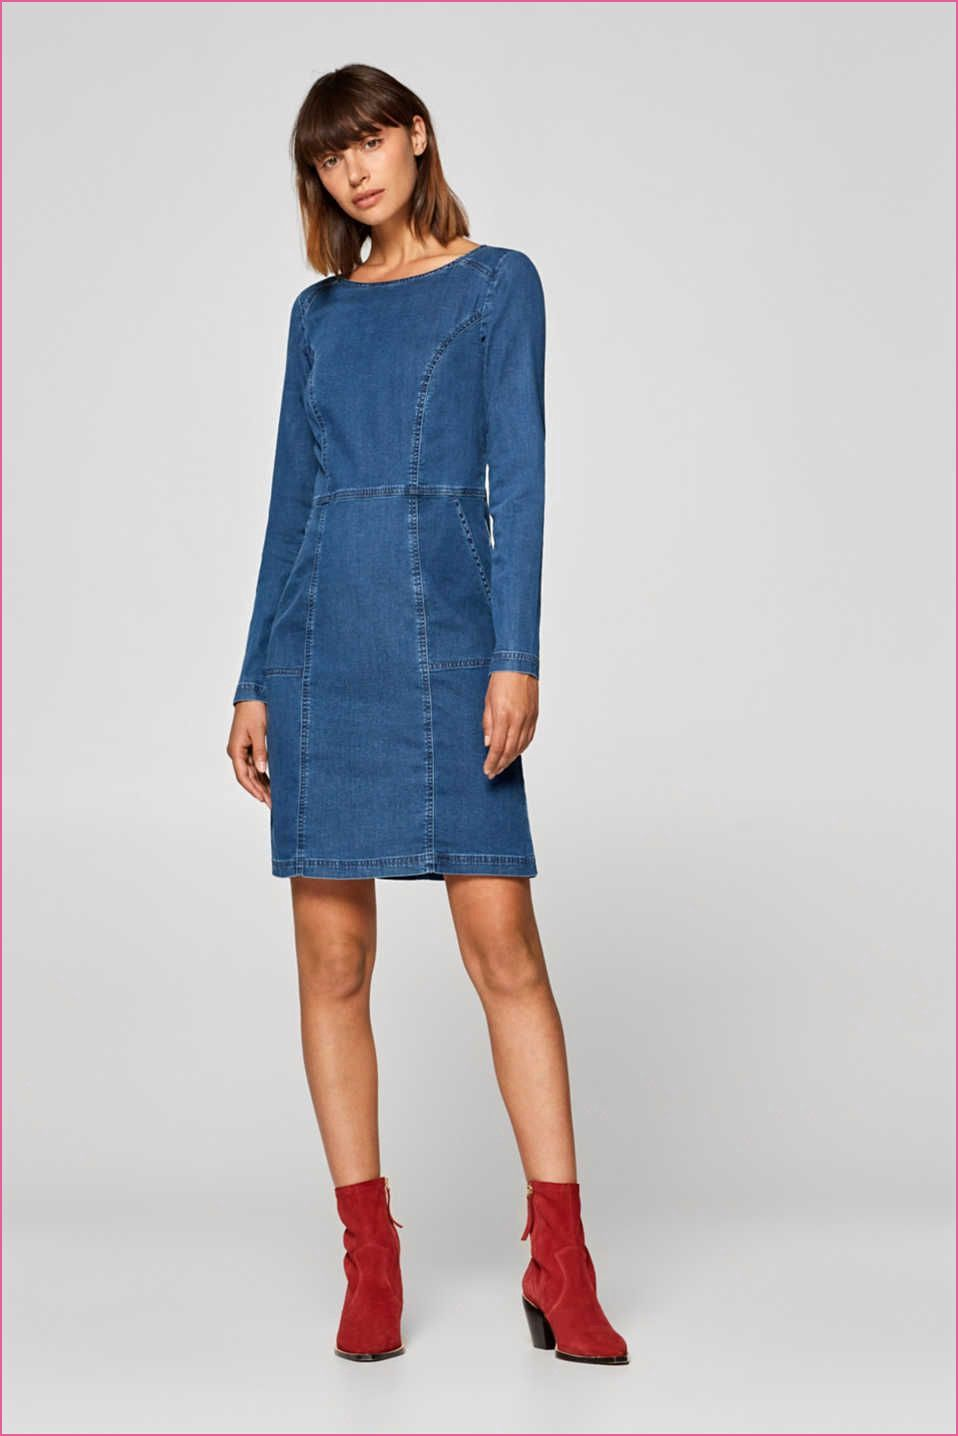 Esprit Kleid Lang Blumen  Haute couture mode, Kleider, Modestil